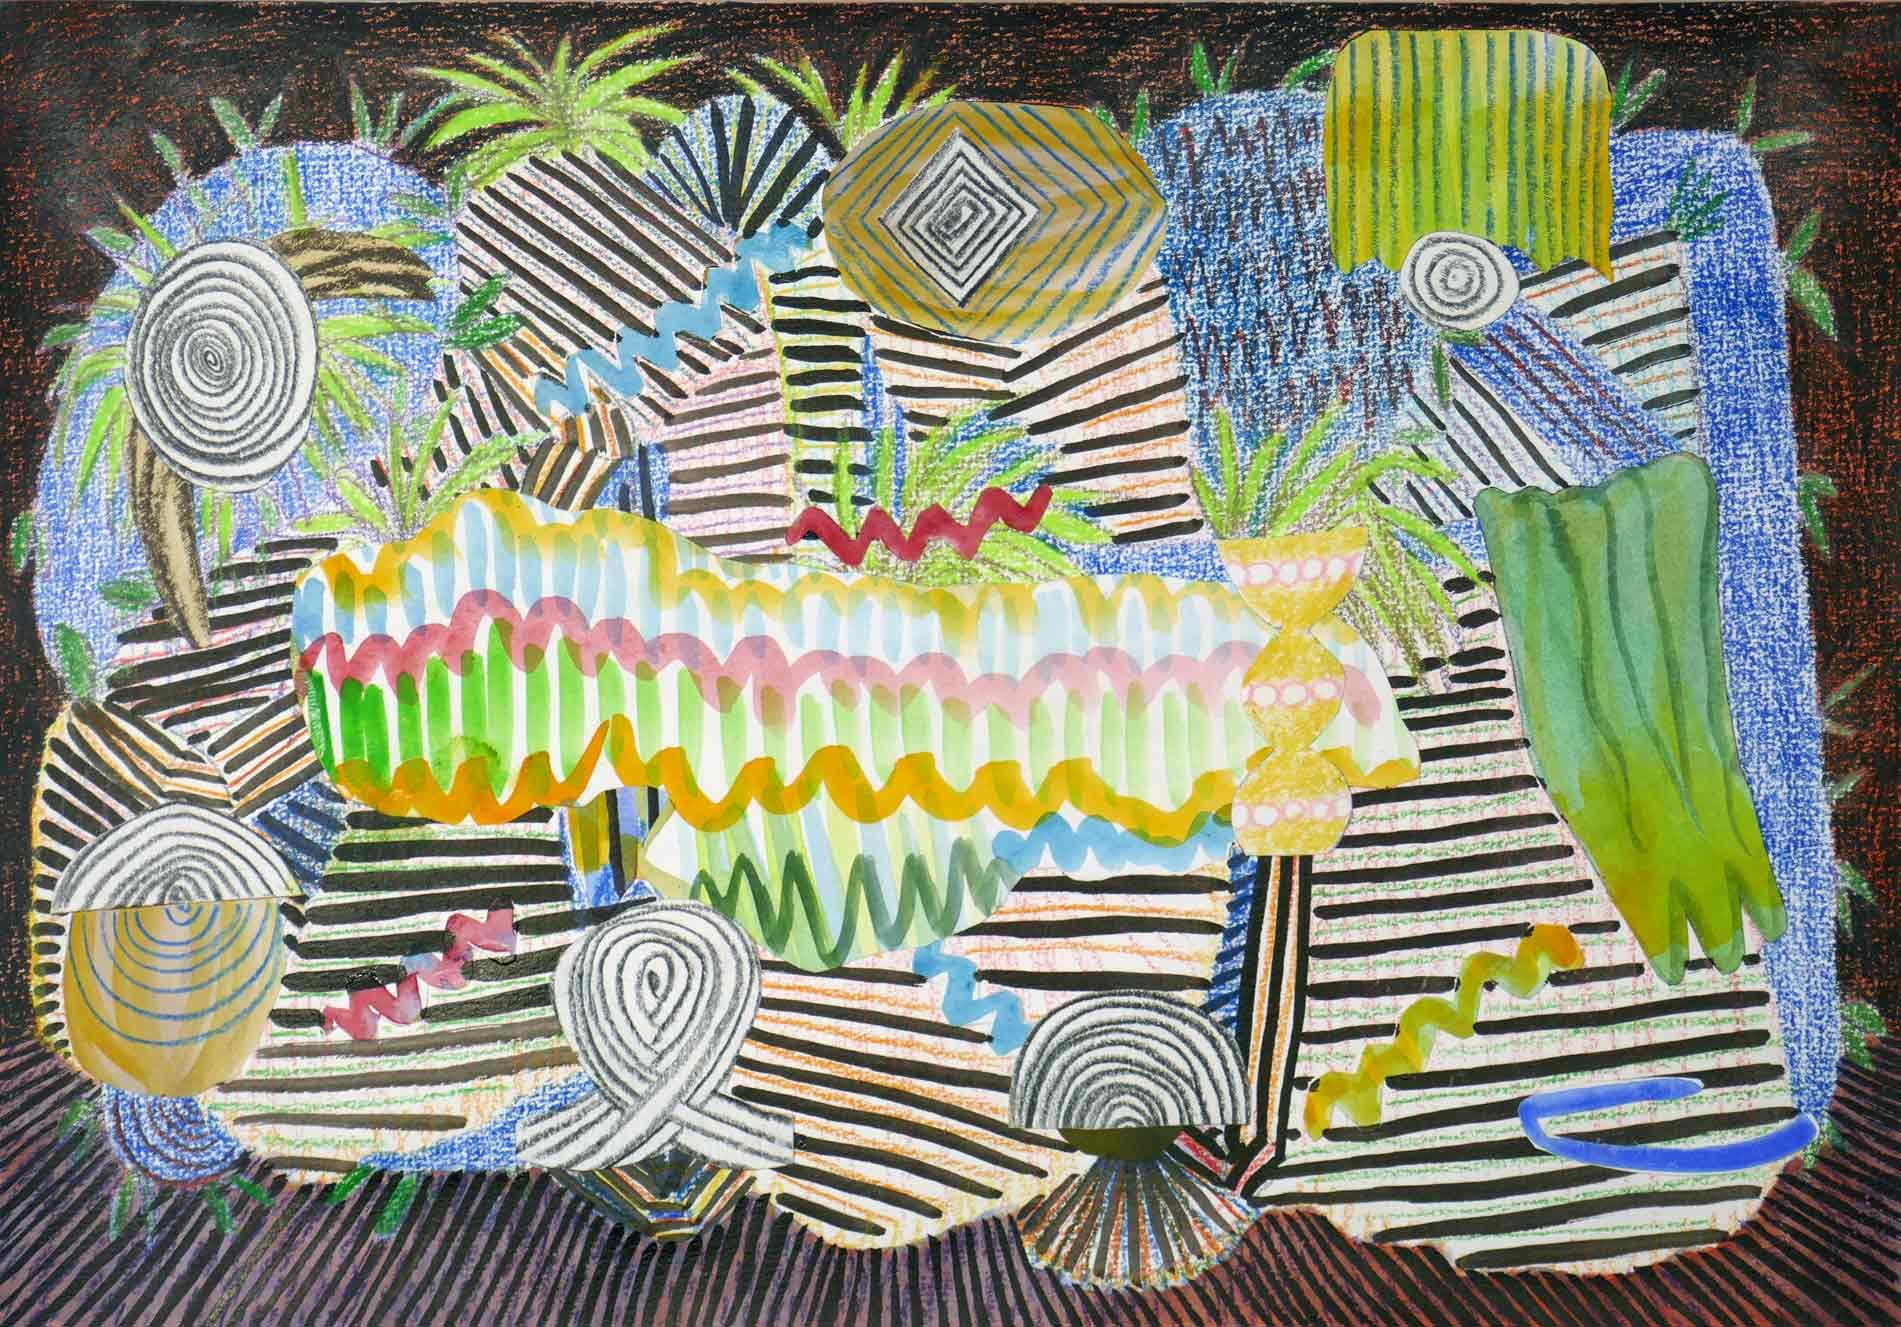 Uit de serie  Singing from the bushes  collage; inkt, potlood, aquarel, gouache 21 x 29 cm, 2018